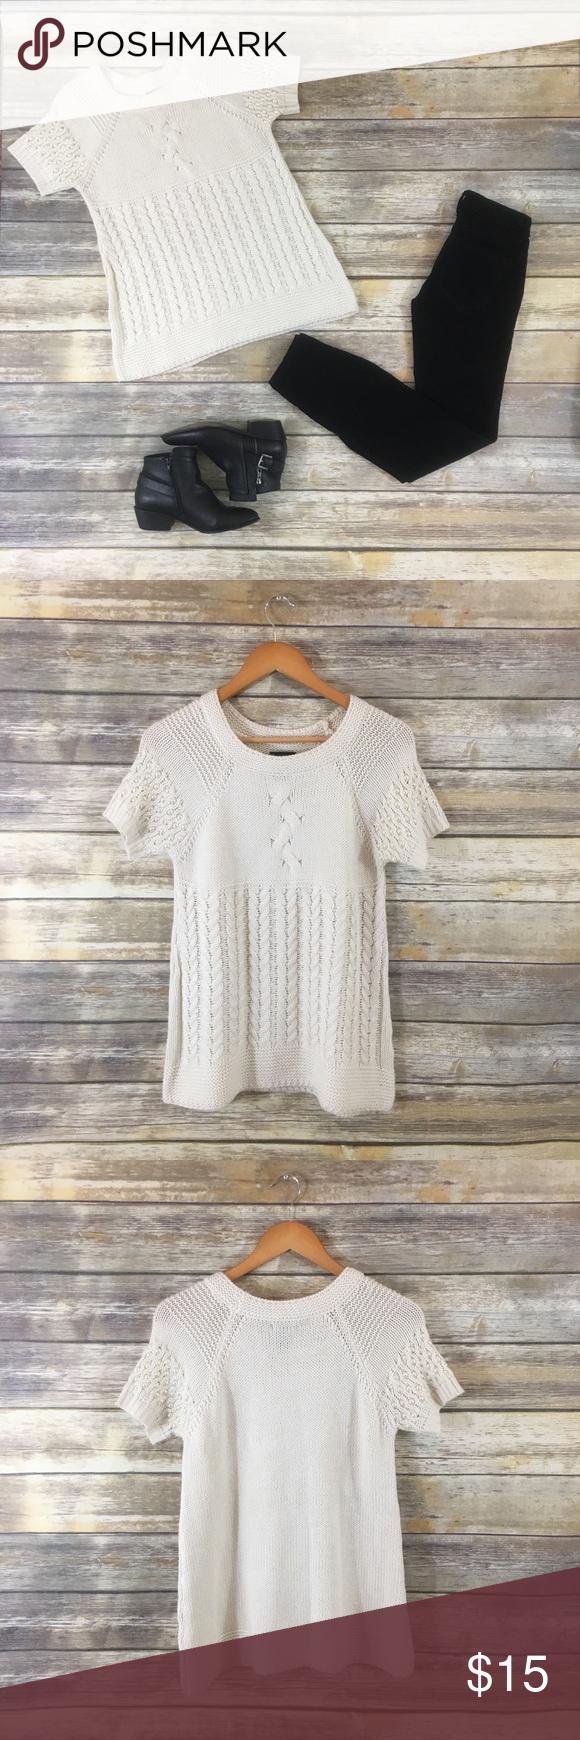 Short sleeve sweater pearl embellished sleeves flat lay short